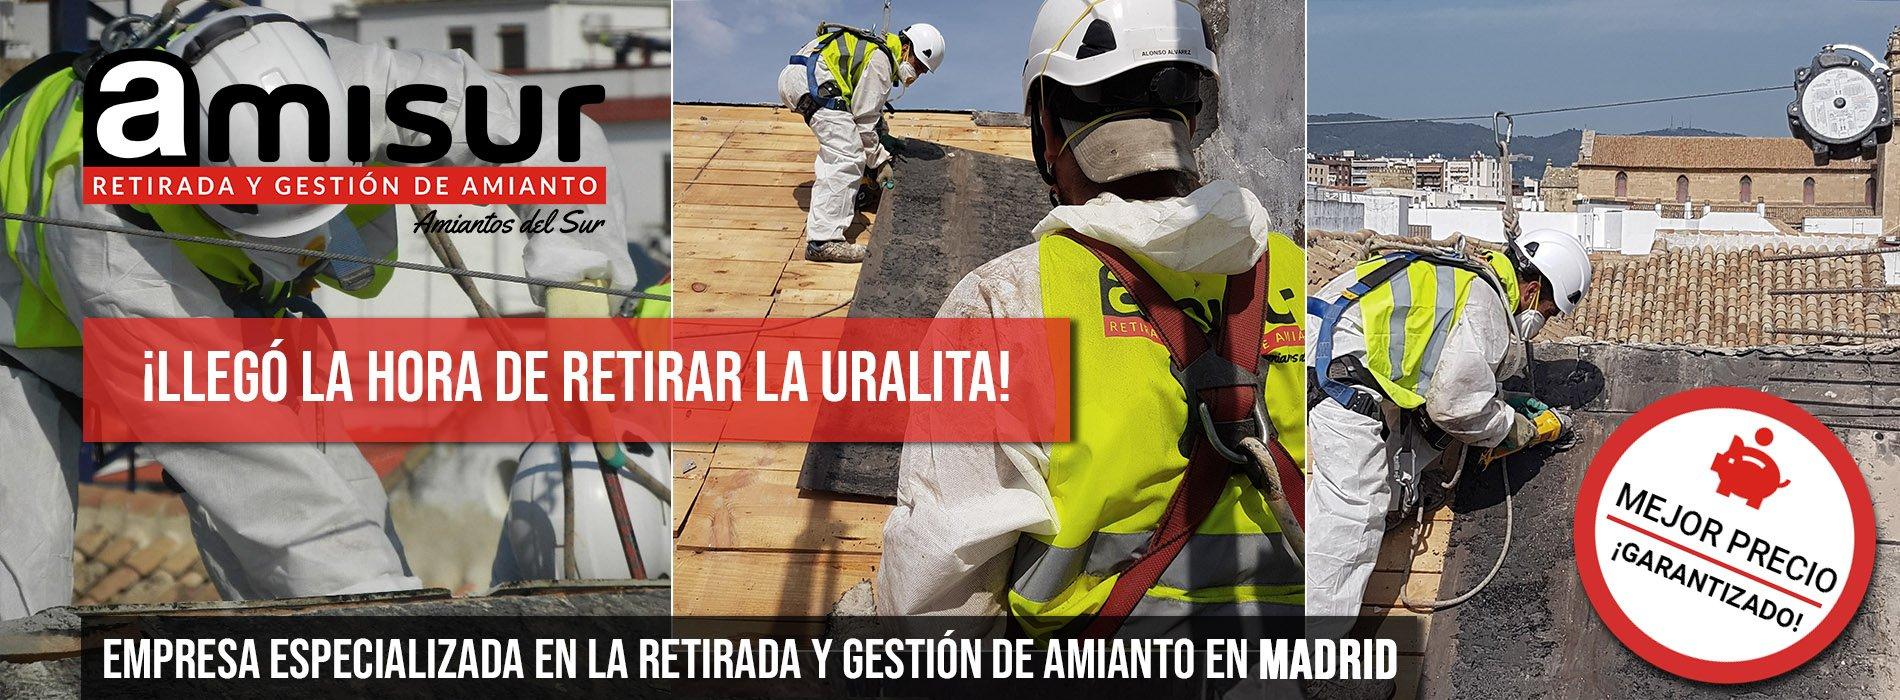 RETIRADA-AMIANTO-MADRID